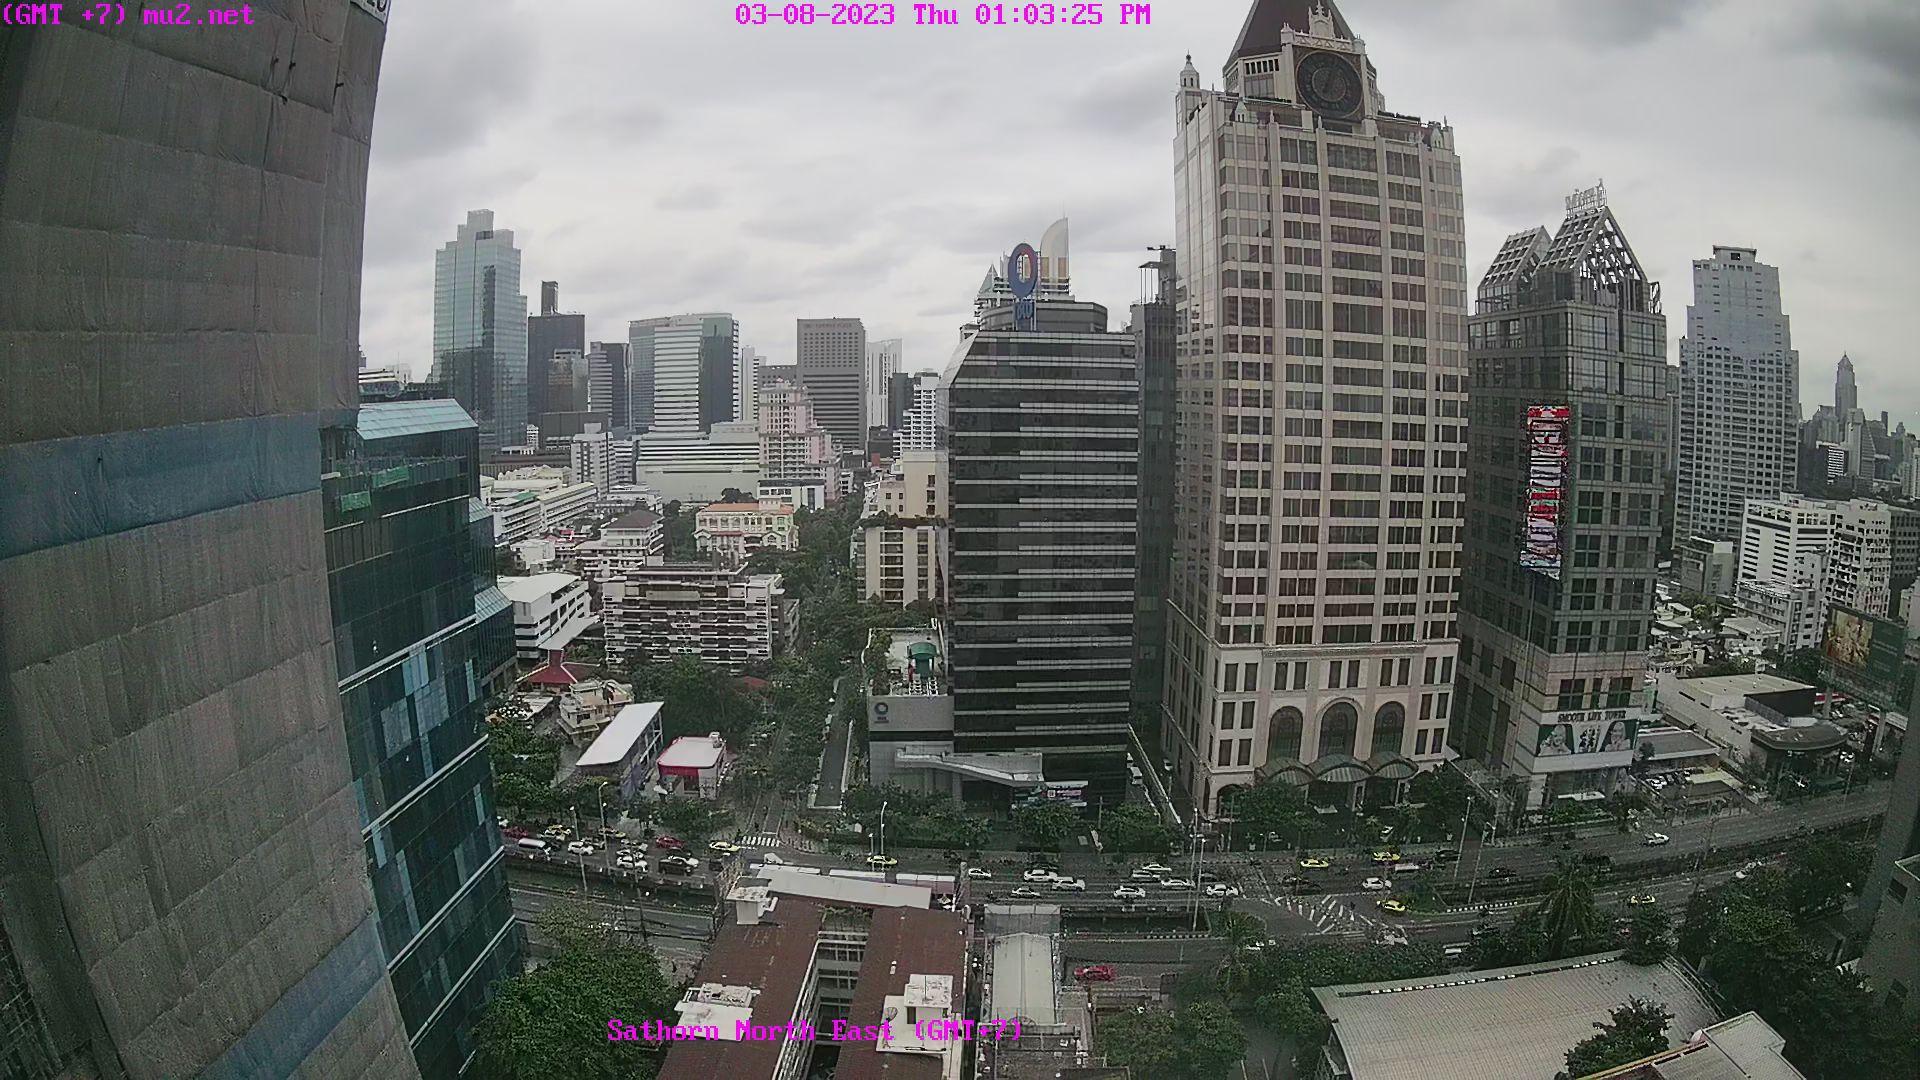 Bangkok Mon. 13:09